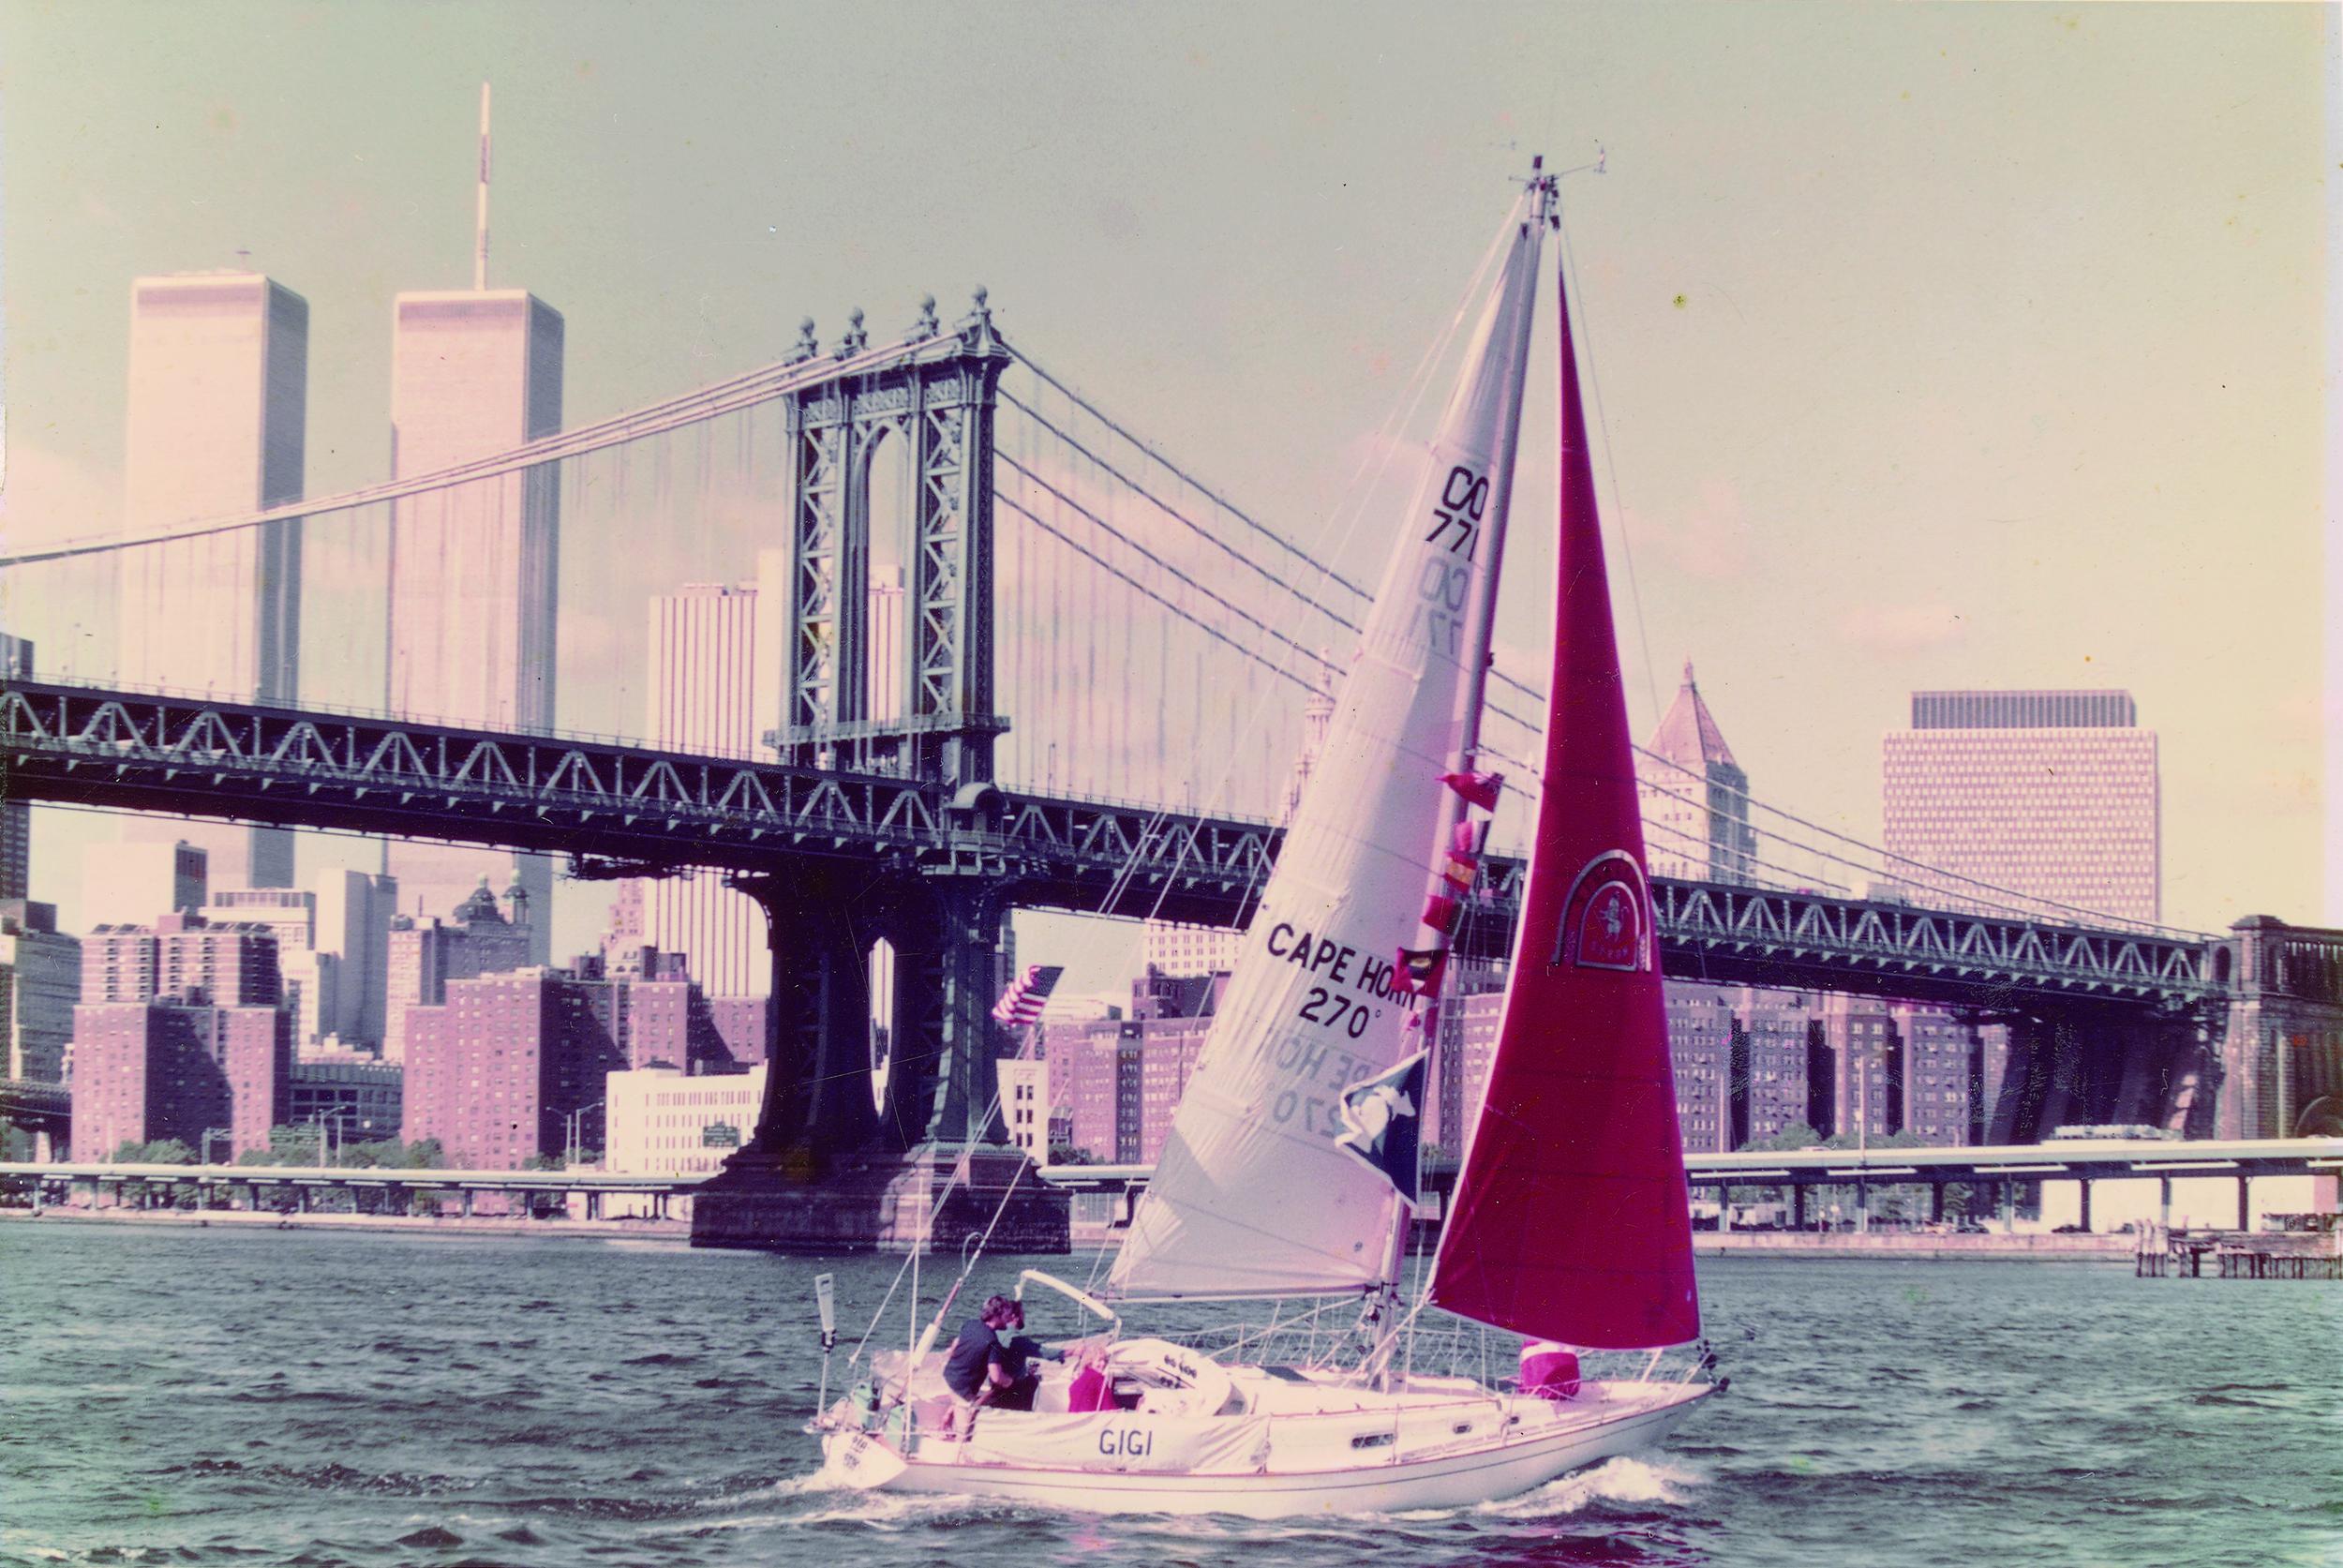 Gigi, the iconic Contessa 32, departing New York harbor